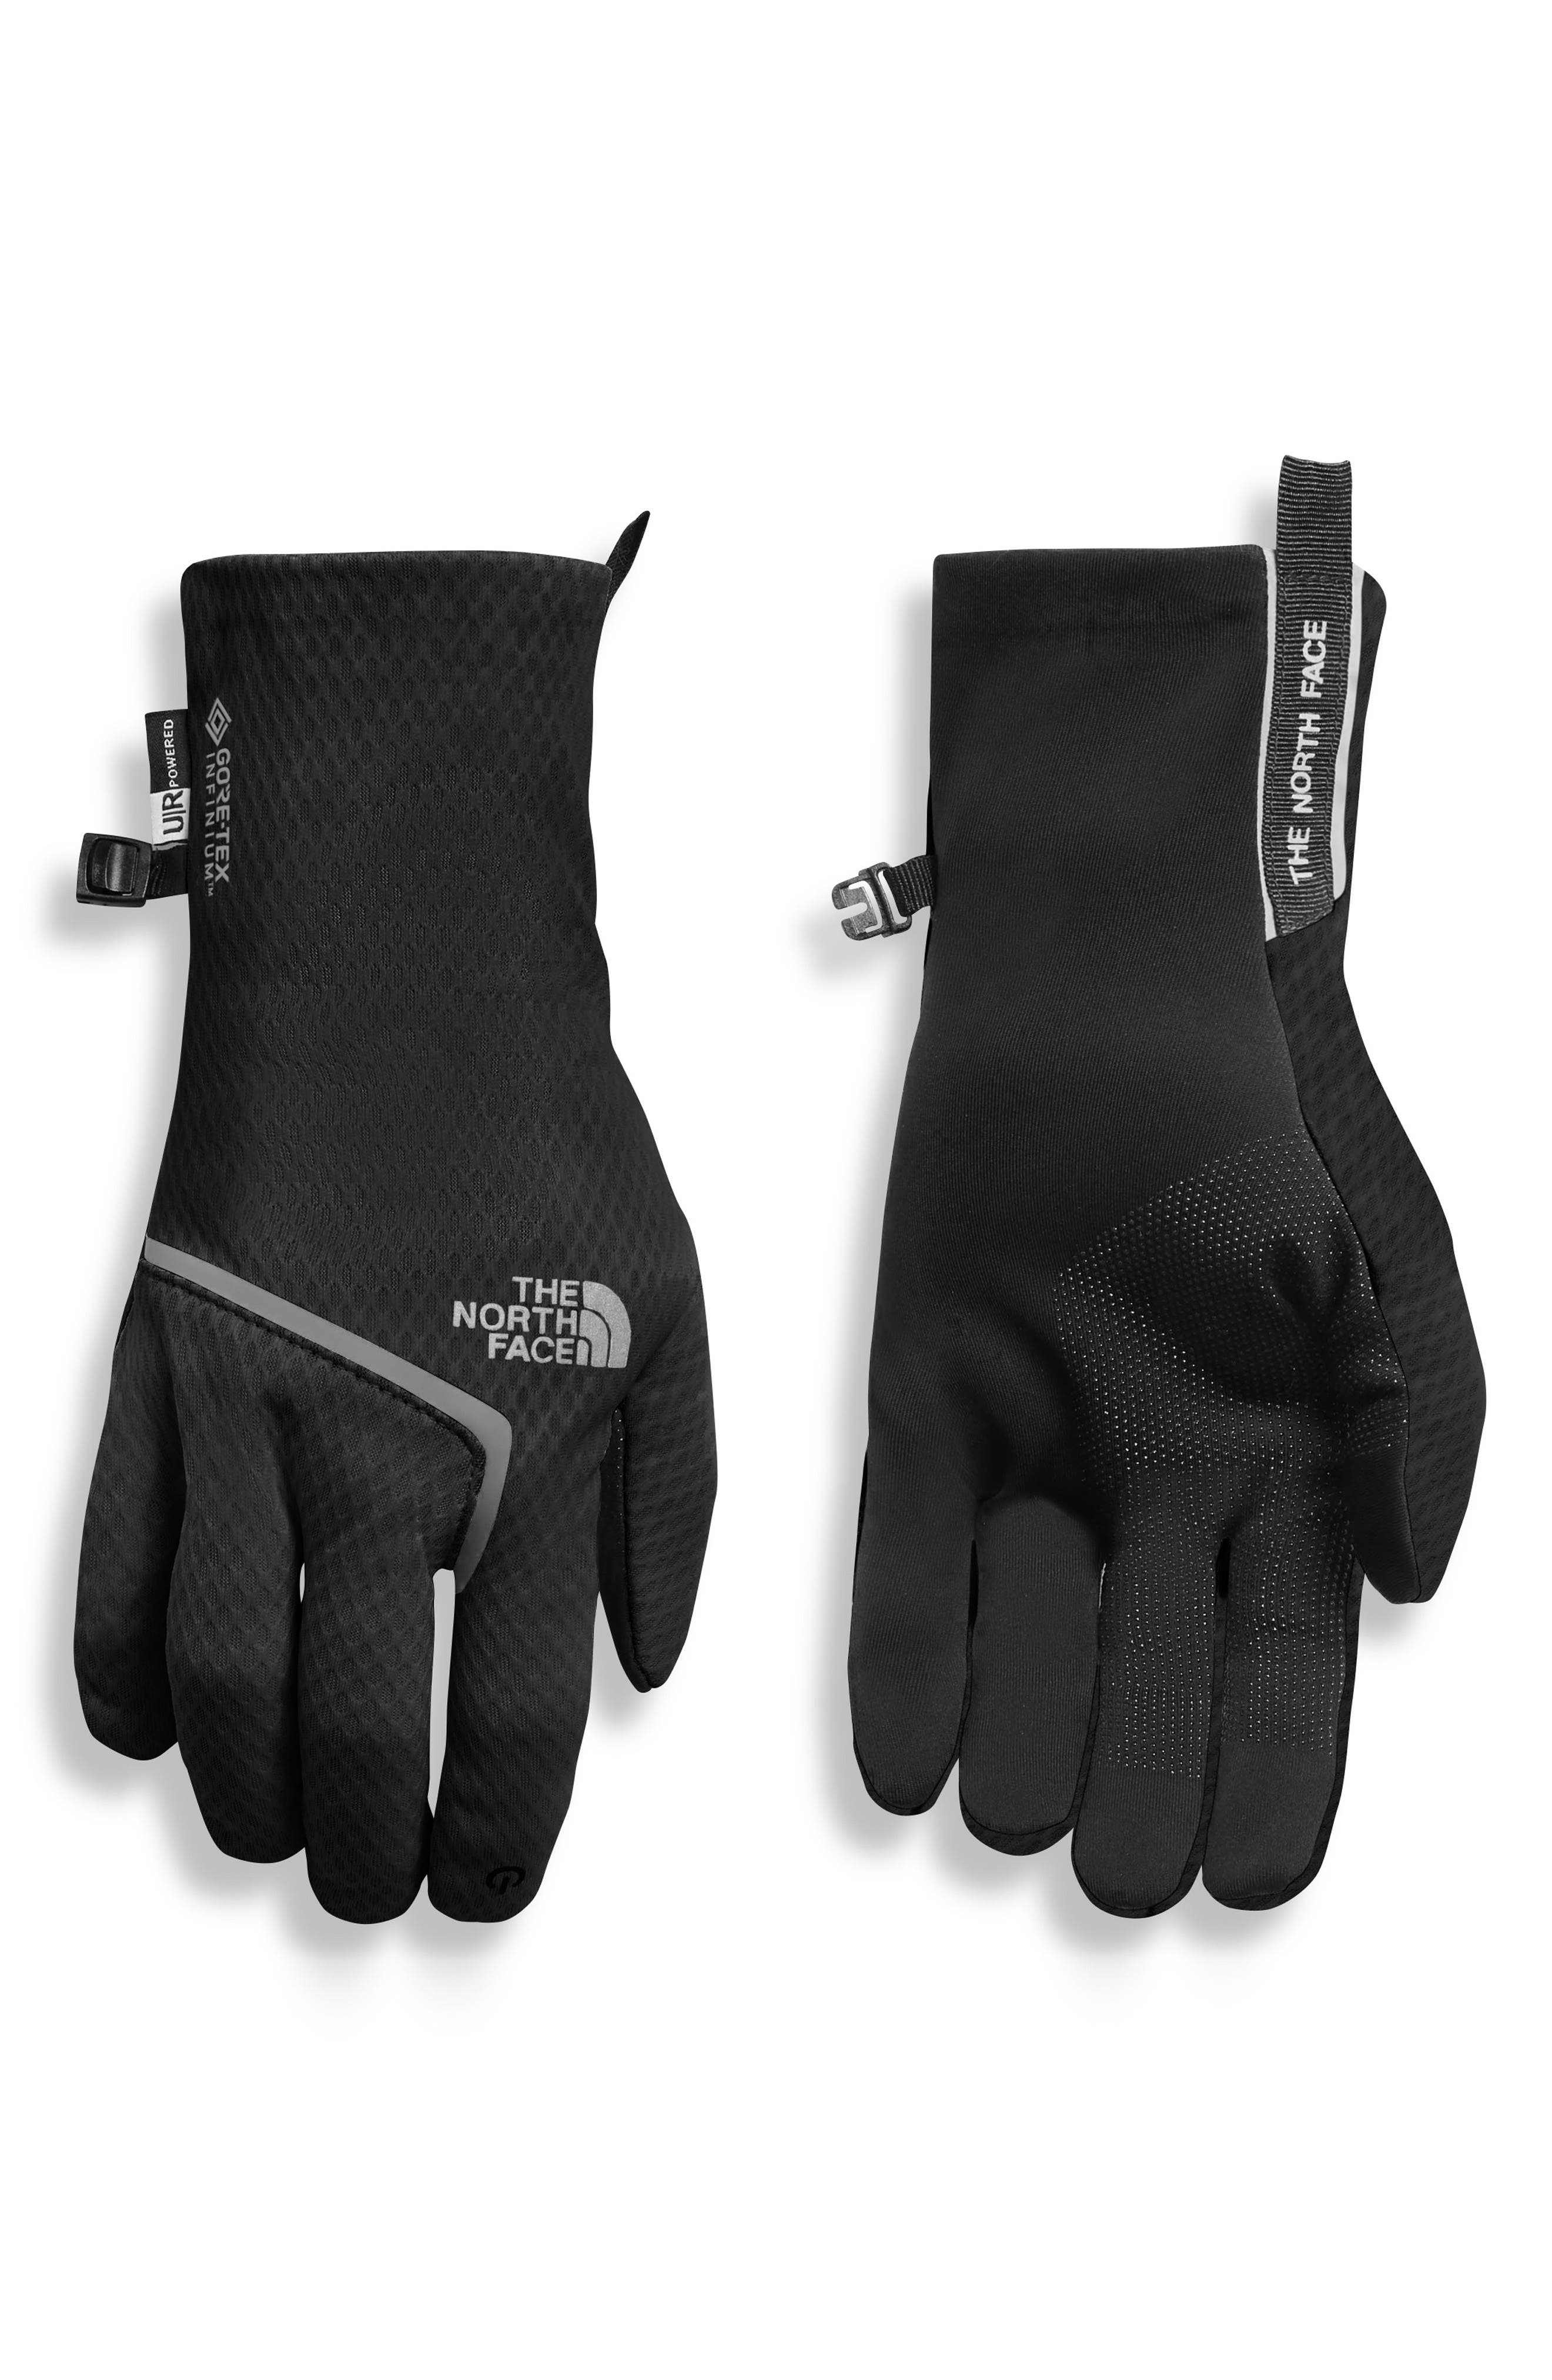 CloseFit Tricot Gloves,                         Main,                         color, TNF BLACK